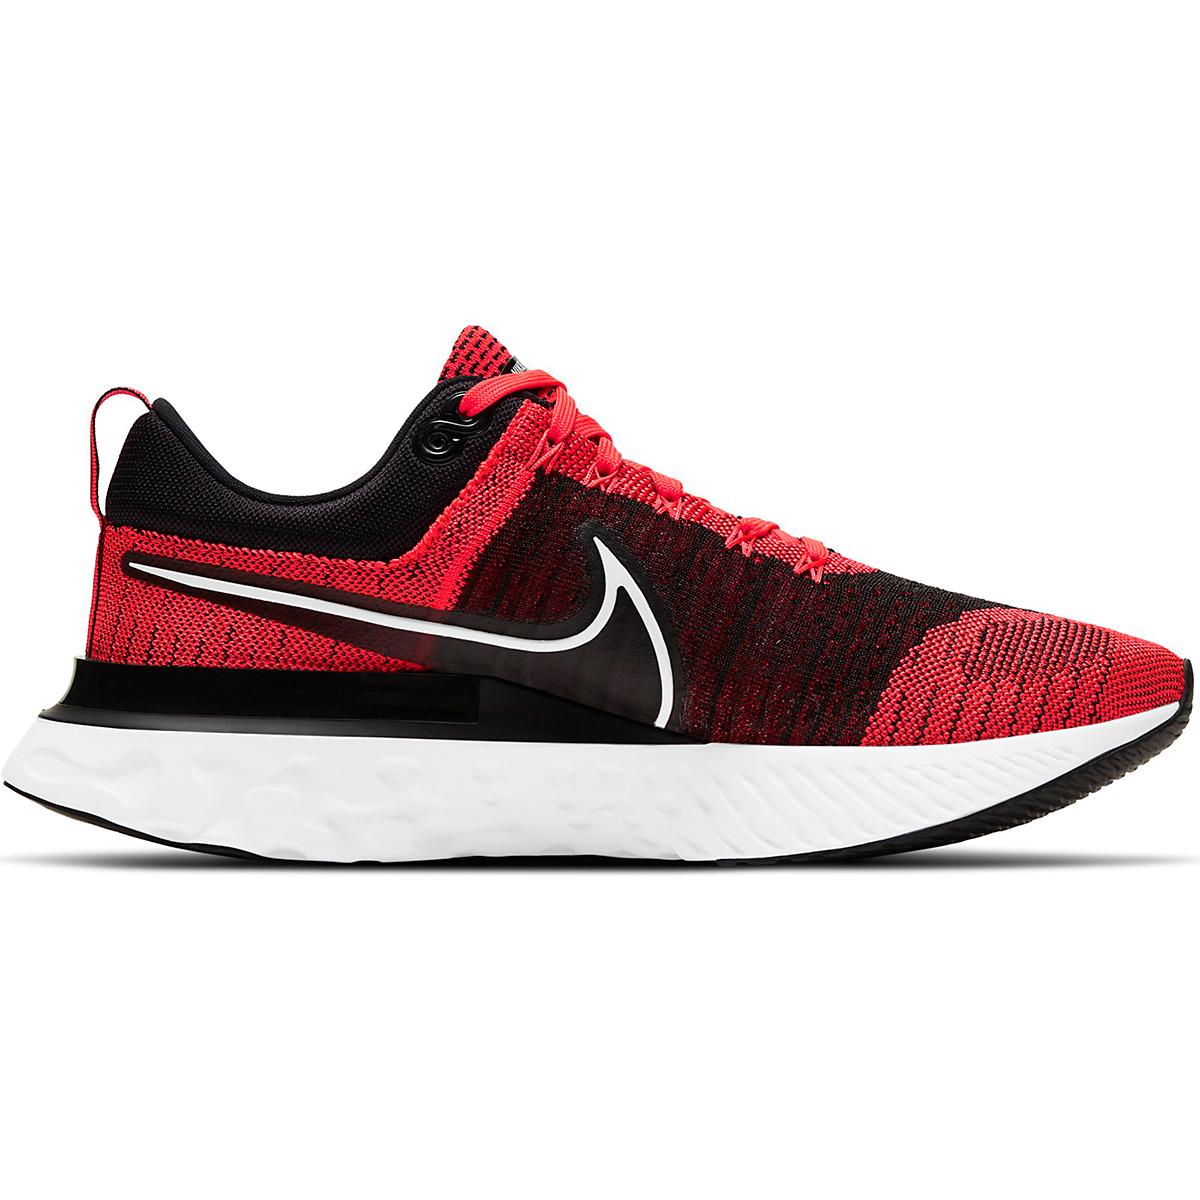 Men's Nike React Infinity Run Flyknit 2 Running Shoe - Color: Bright Crimson/White/Black/Smike Grey - Size: 6 - Width: Regular, Bright Crimson/White/Black/Smike Grey, large, image 1